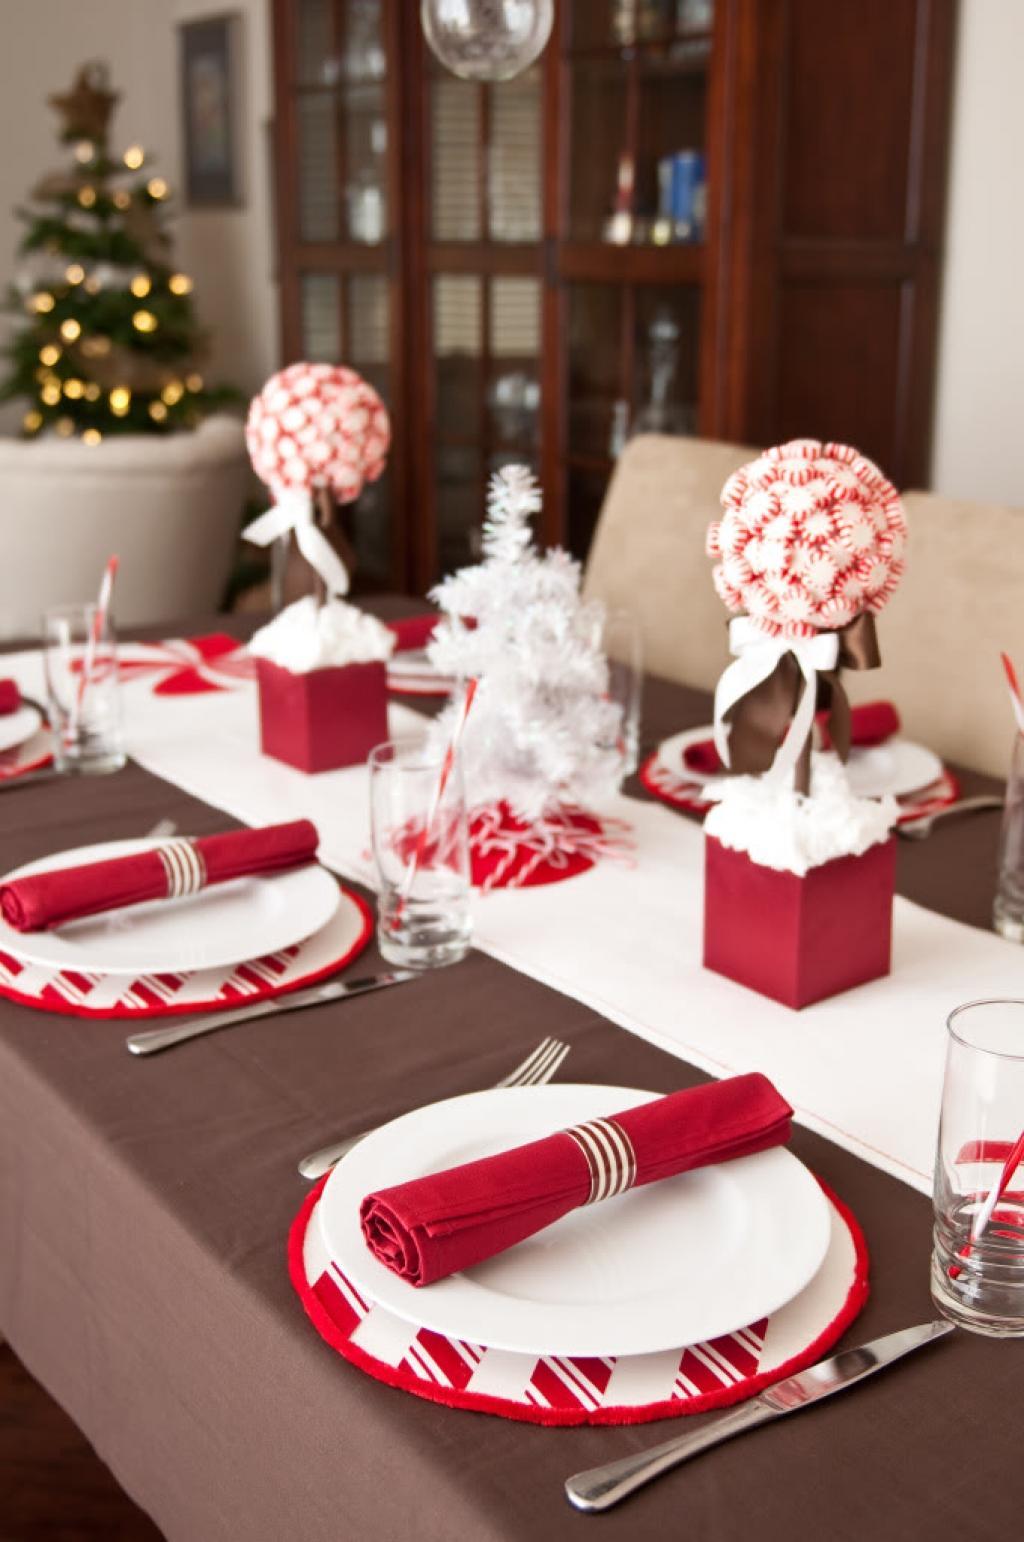 Photo Decoration Table De Noel Amazing With Photo Decoration  # Deco Des Table Tv En Rouge Et Blanc